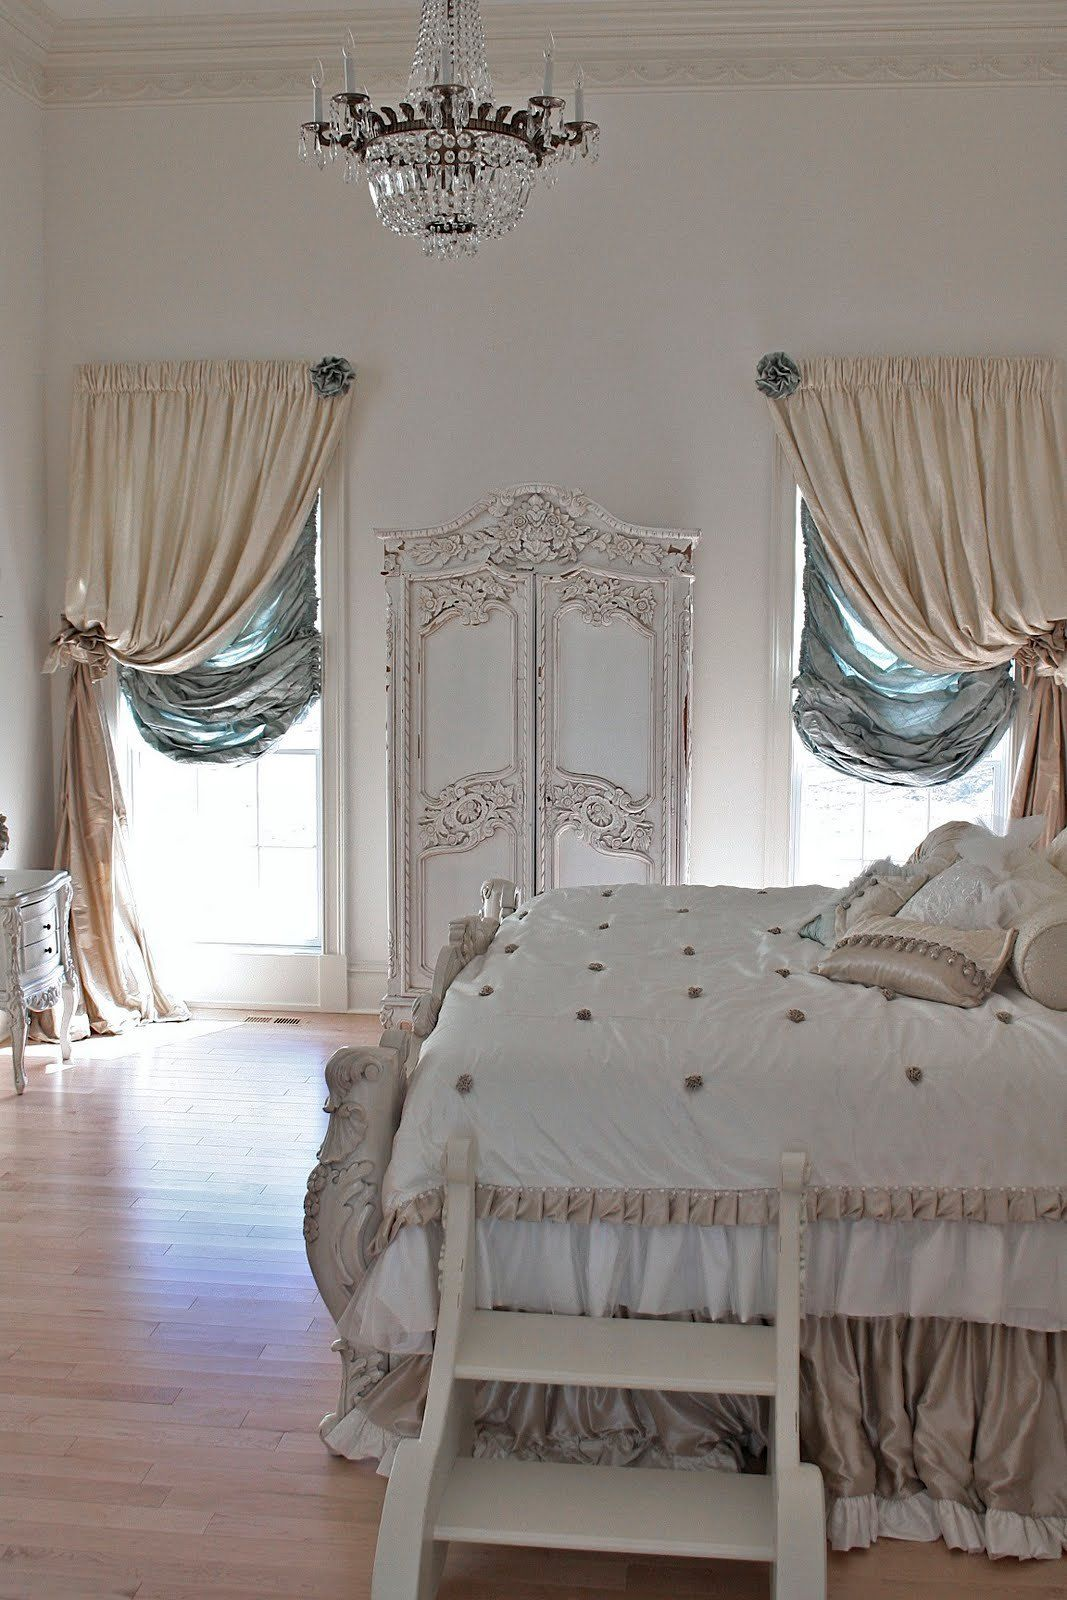 Romantic Bedroom Curtains: Romantic Home Decor, Home Bedroom